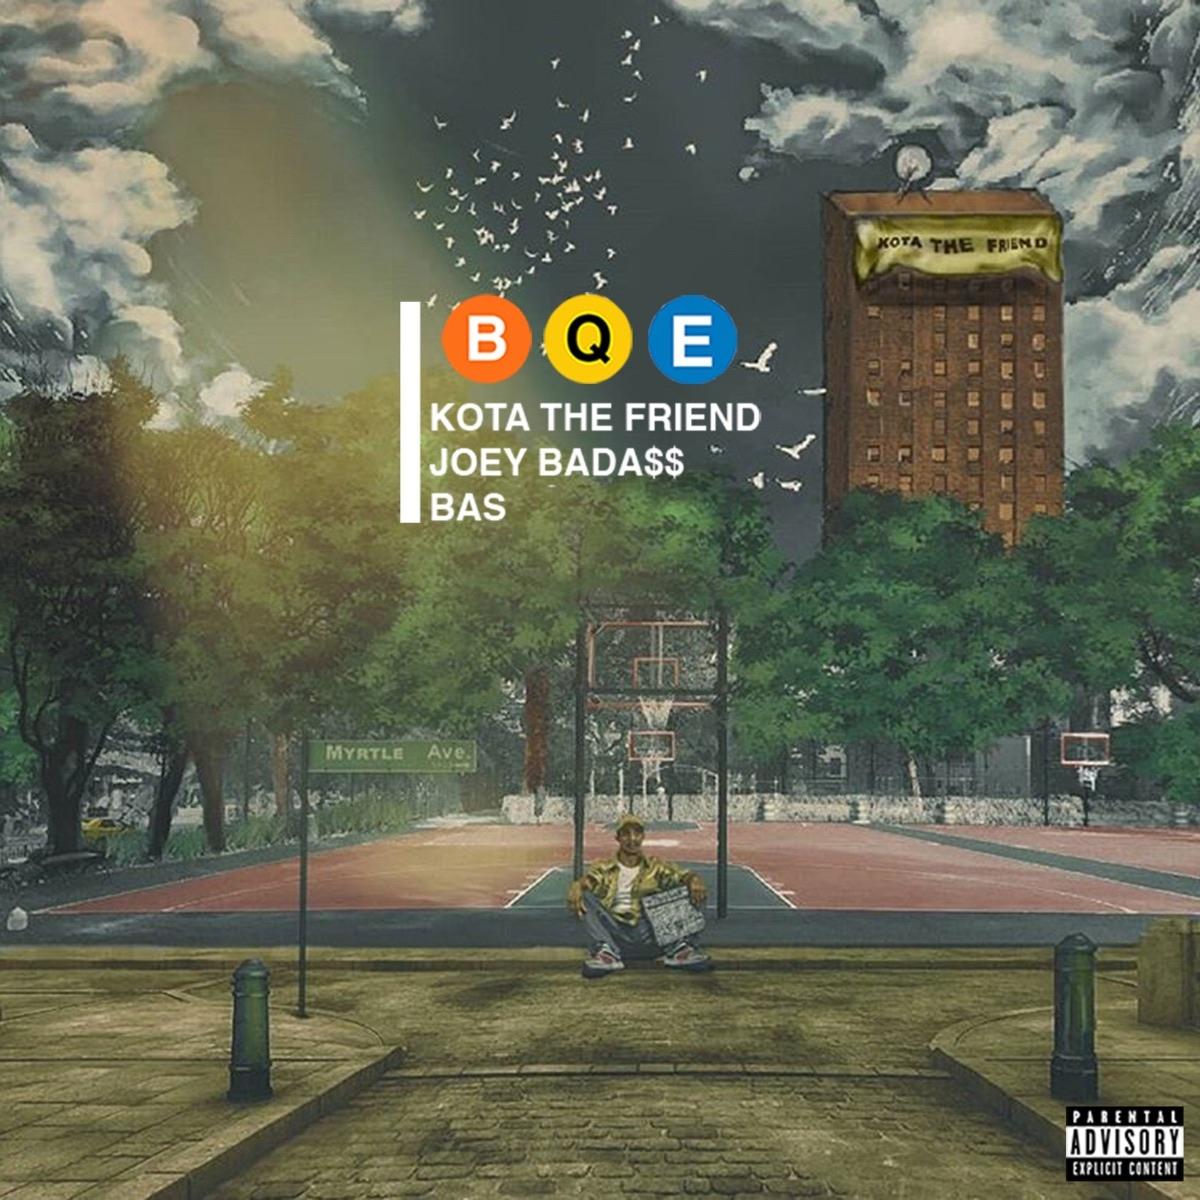 KOTA The Friend — «B.Q.E.» (Feat. Joey Bada$$ & Bas)